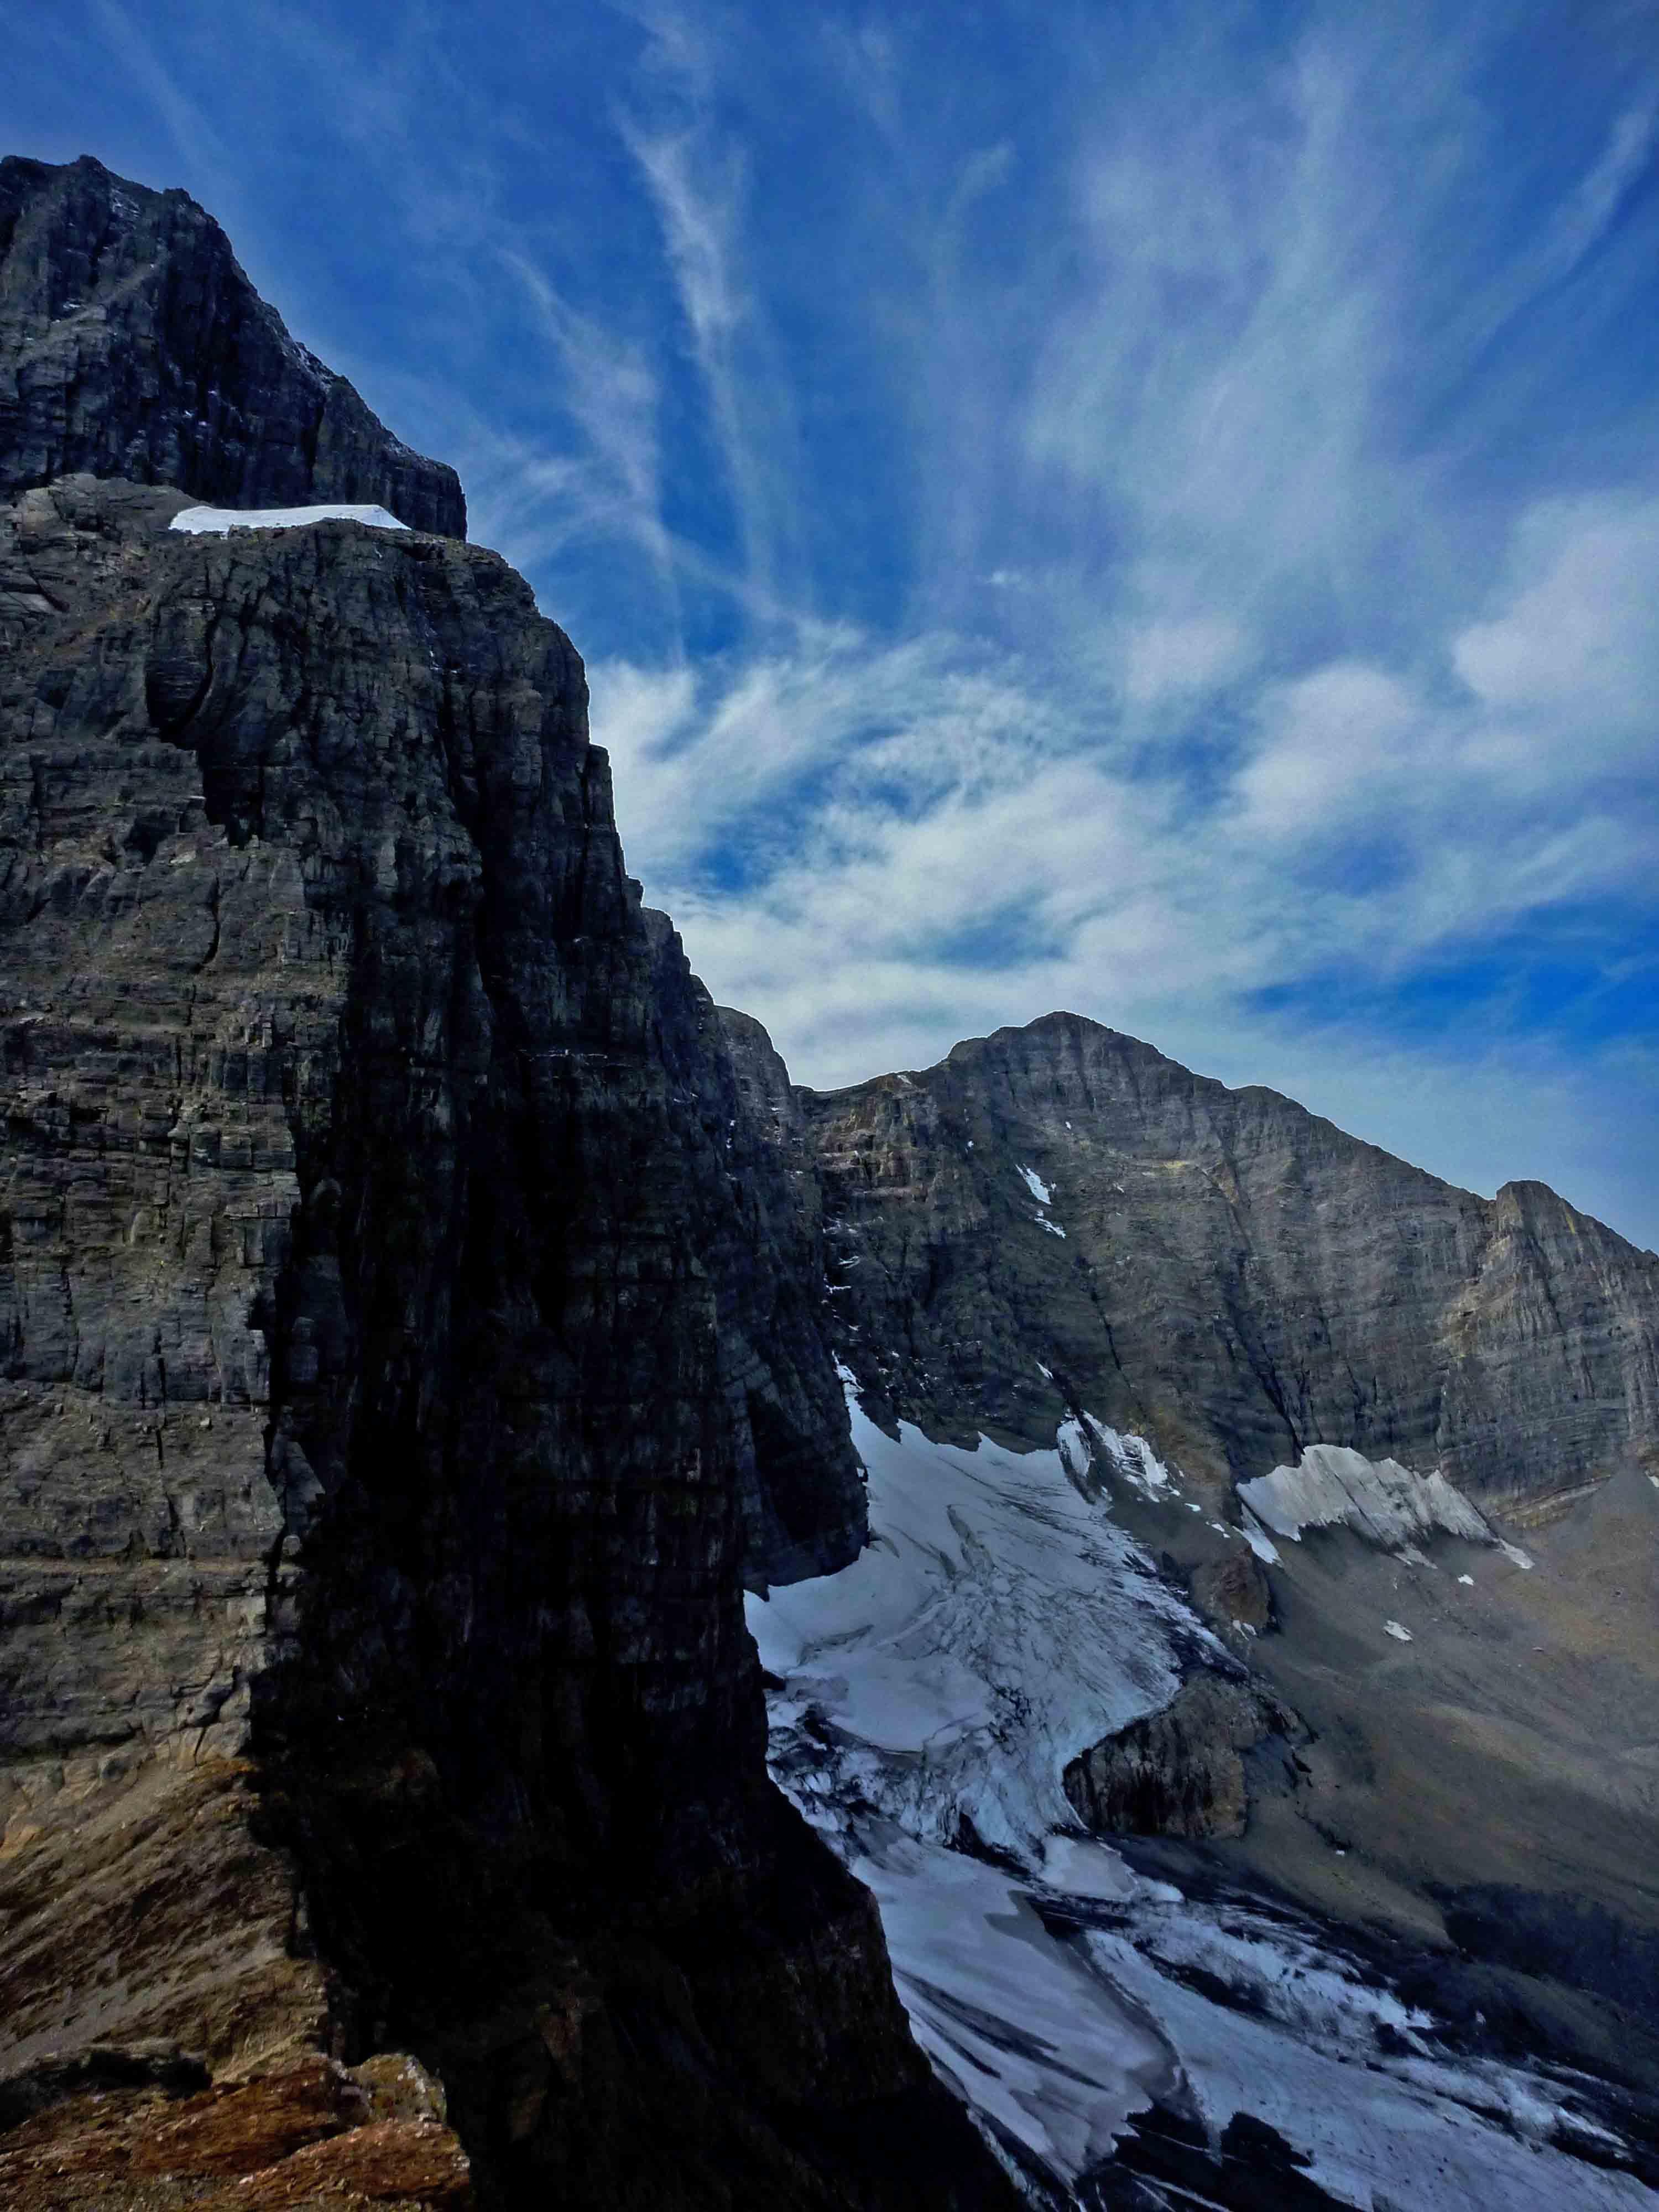 The Rockwall - Kootenay National Park backpackin